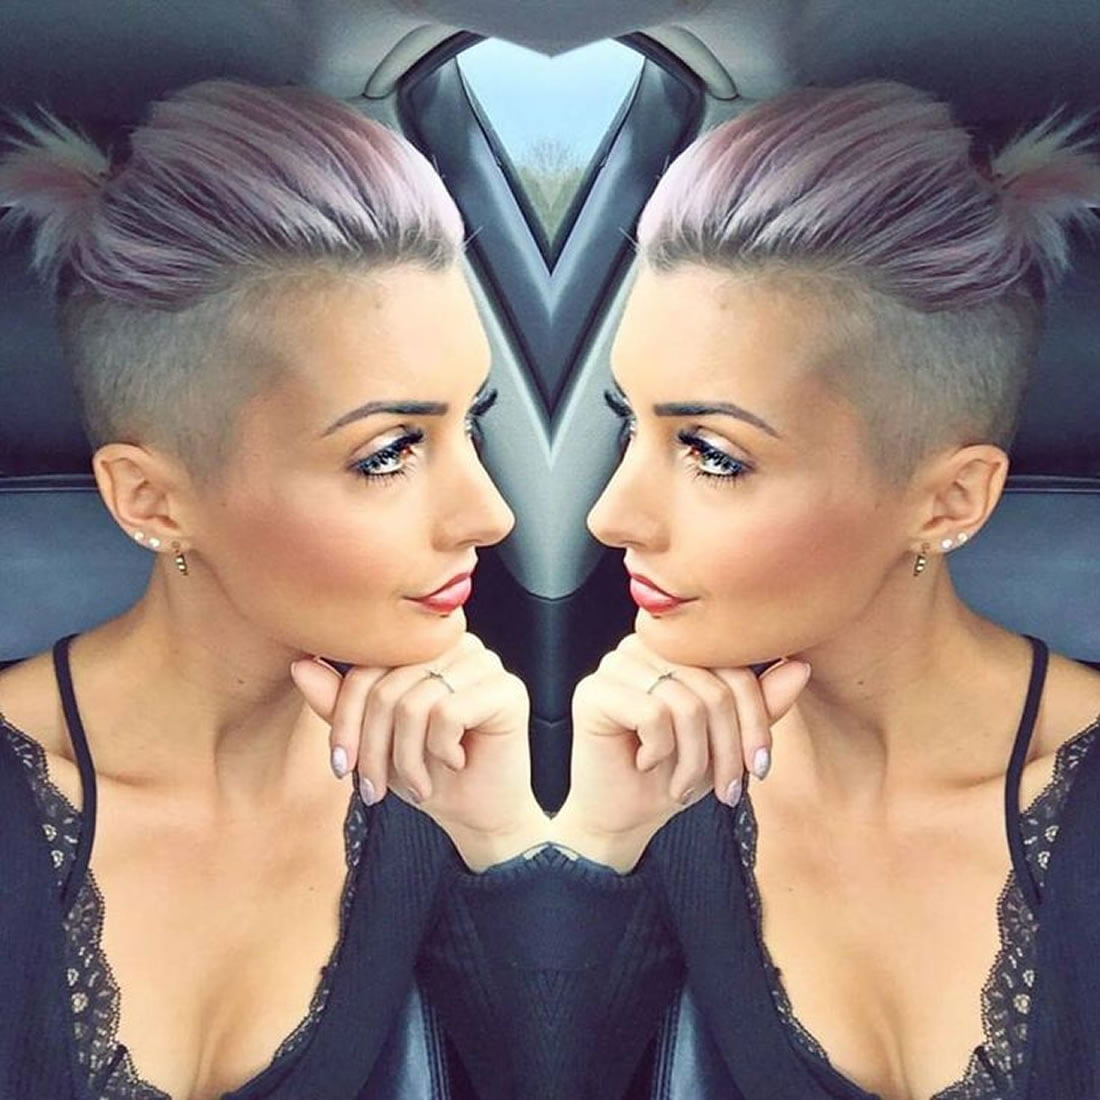 Undercut Short Hairstyles for Women